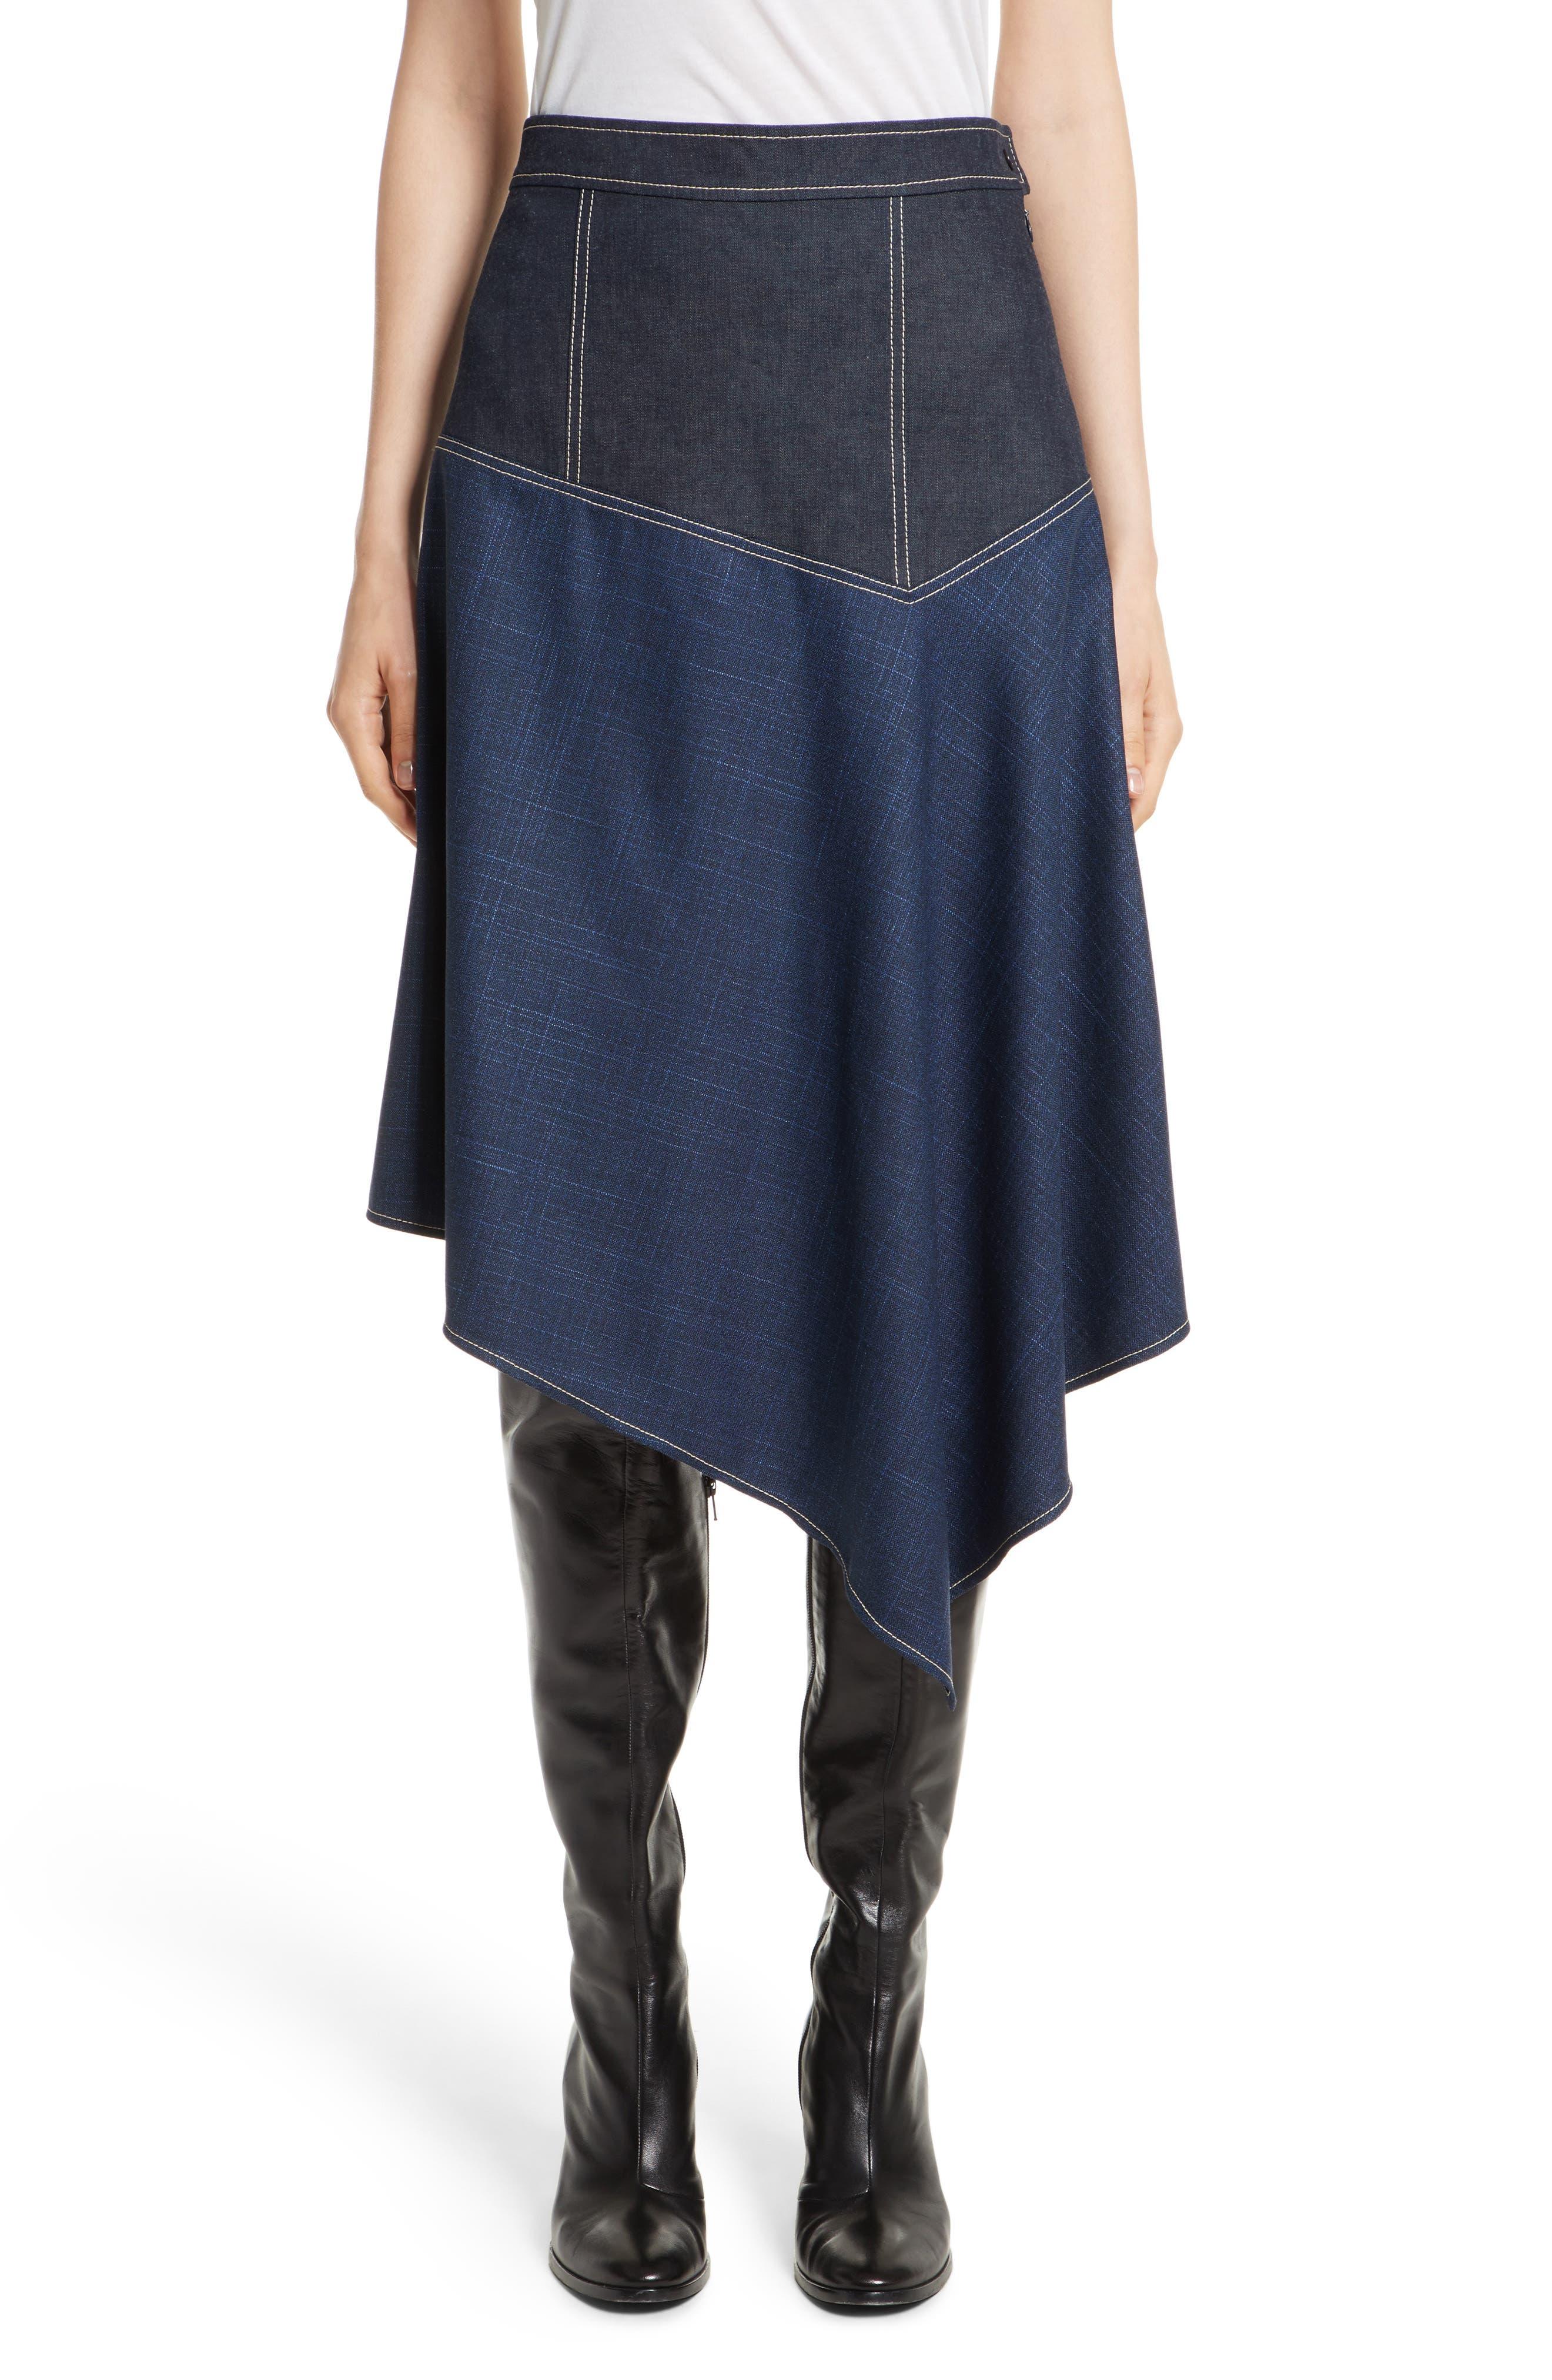 Alternate Image 1 Selected - Colovos Asymmetrical Mixed Media Skirt